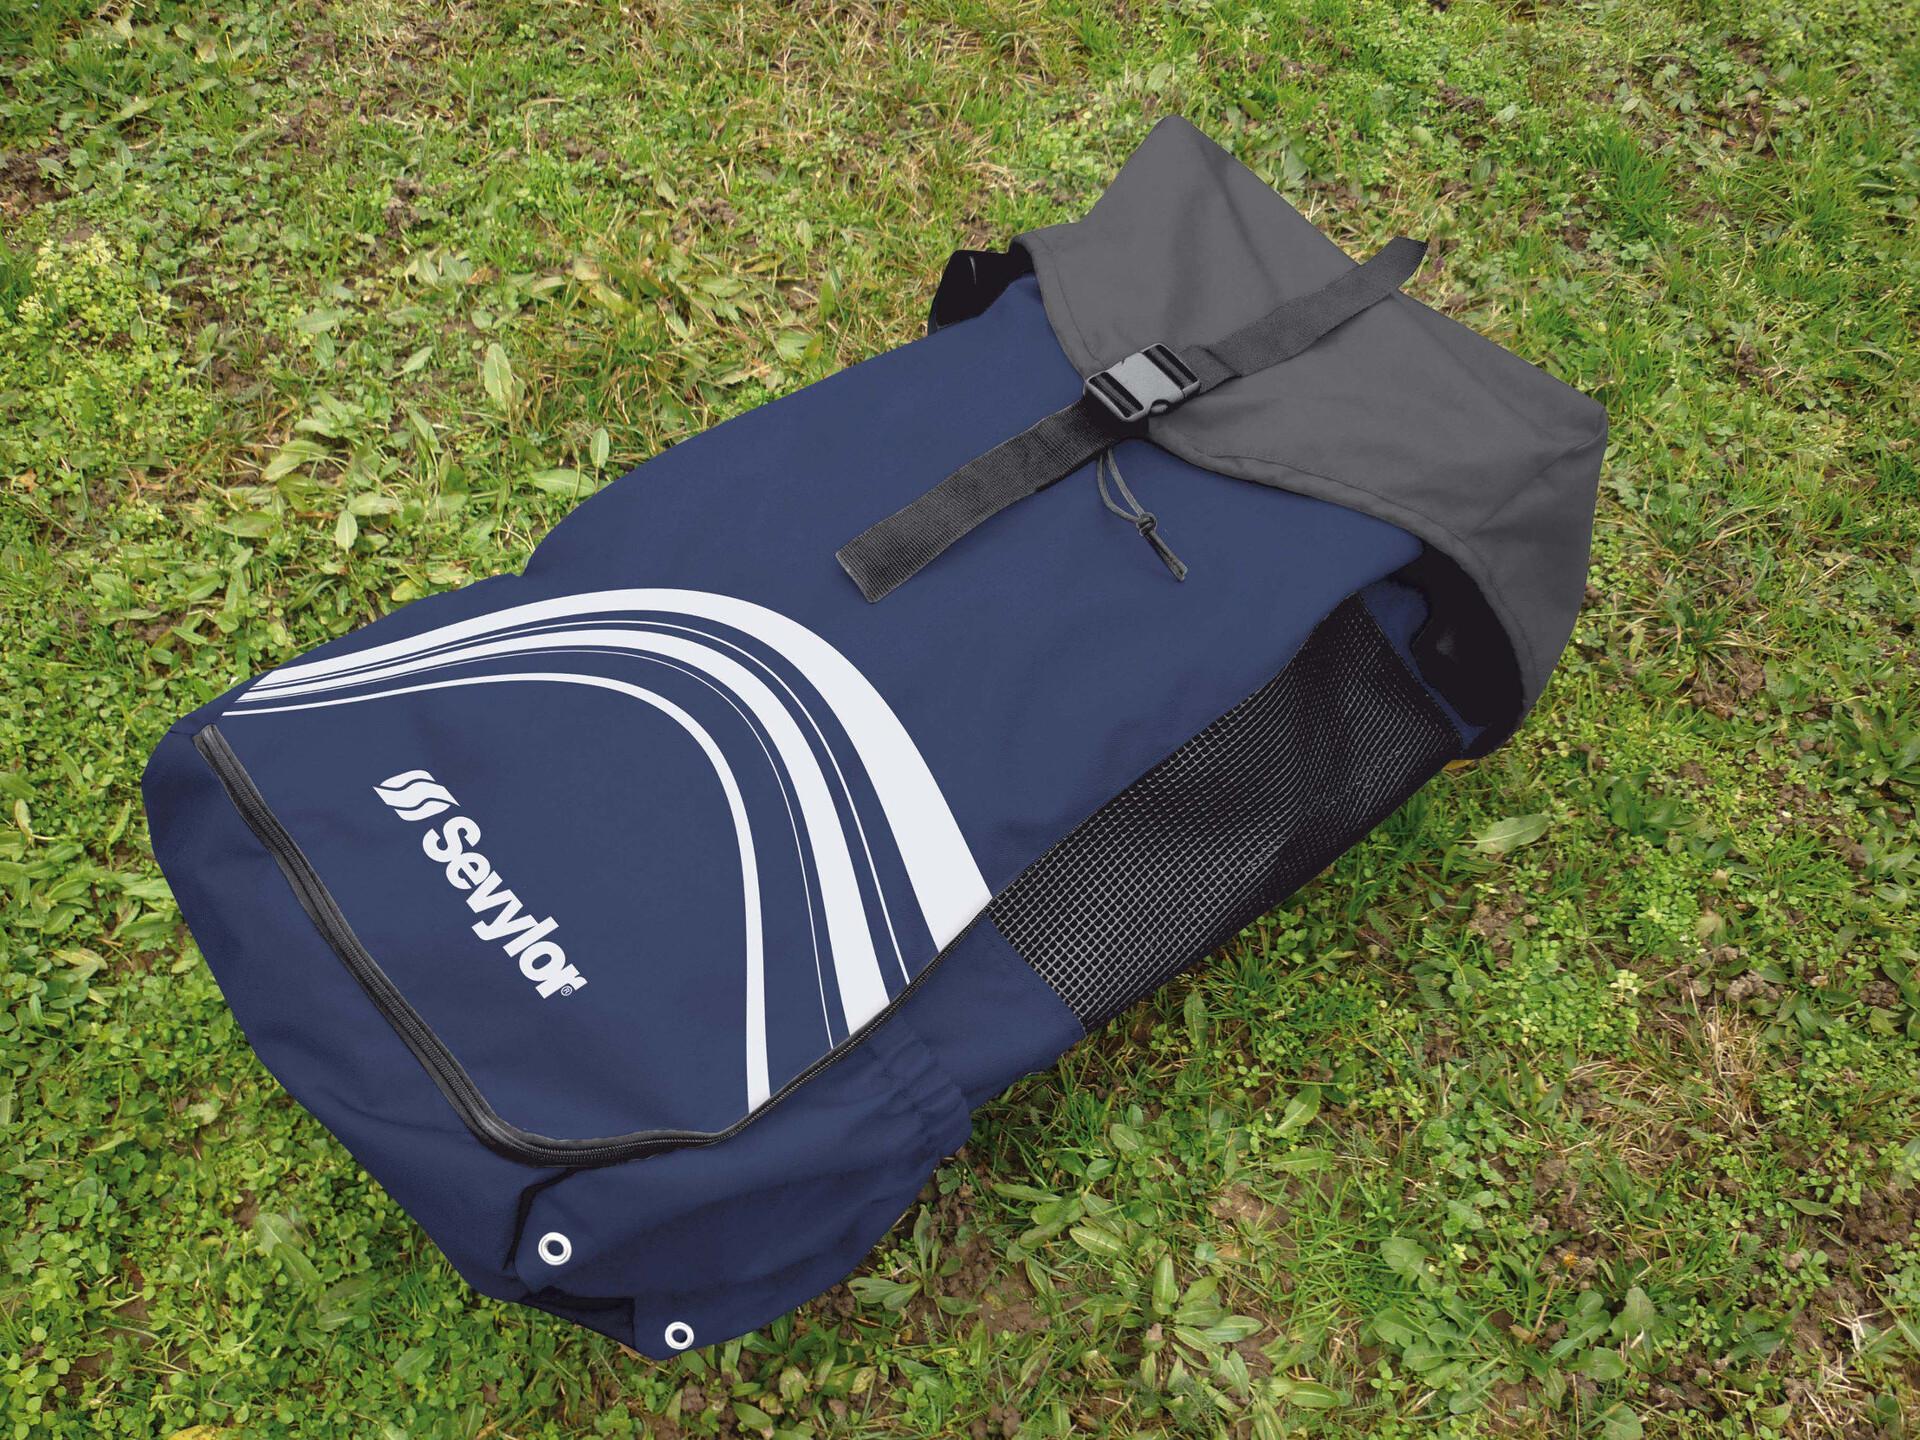 Bootsport Zubehör Sevylor QuikPak Carry Bag für Kajaks Kanus Boote Transport Rucksack